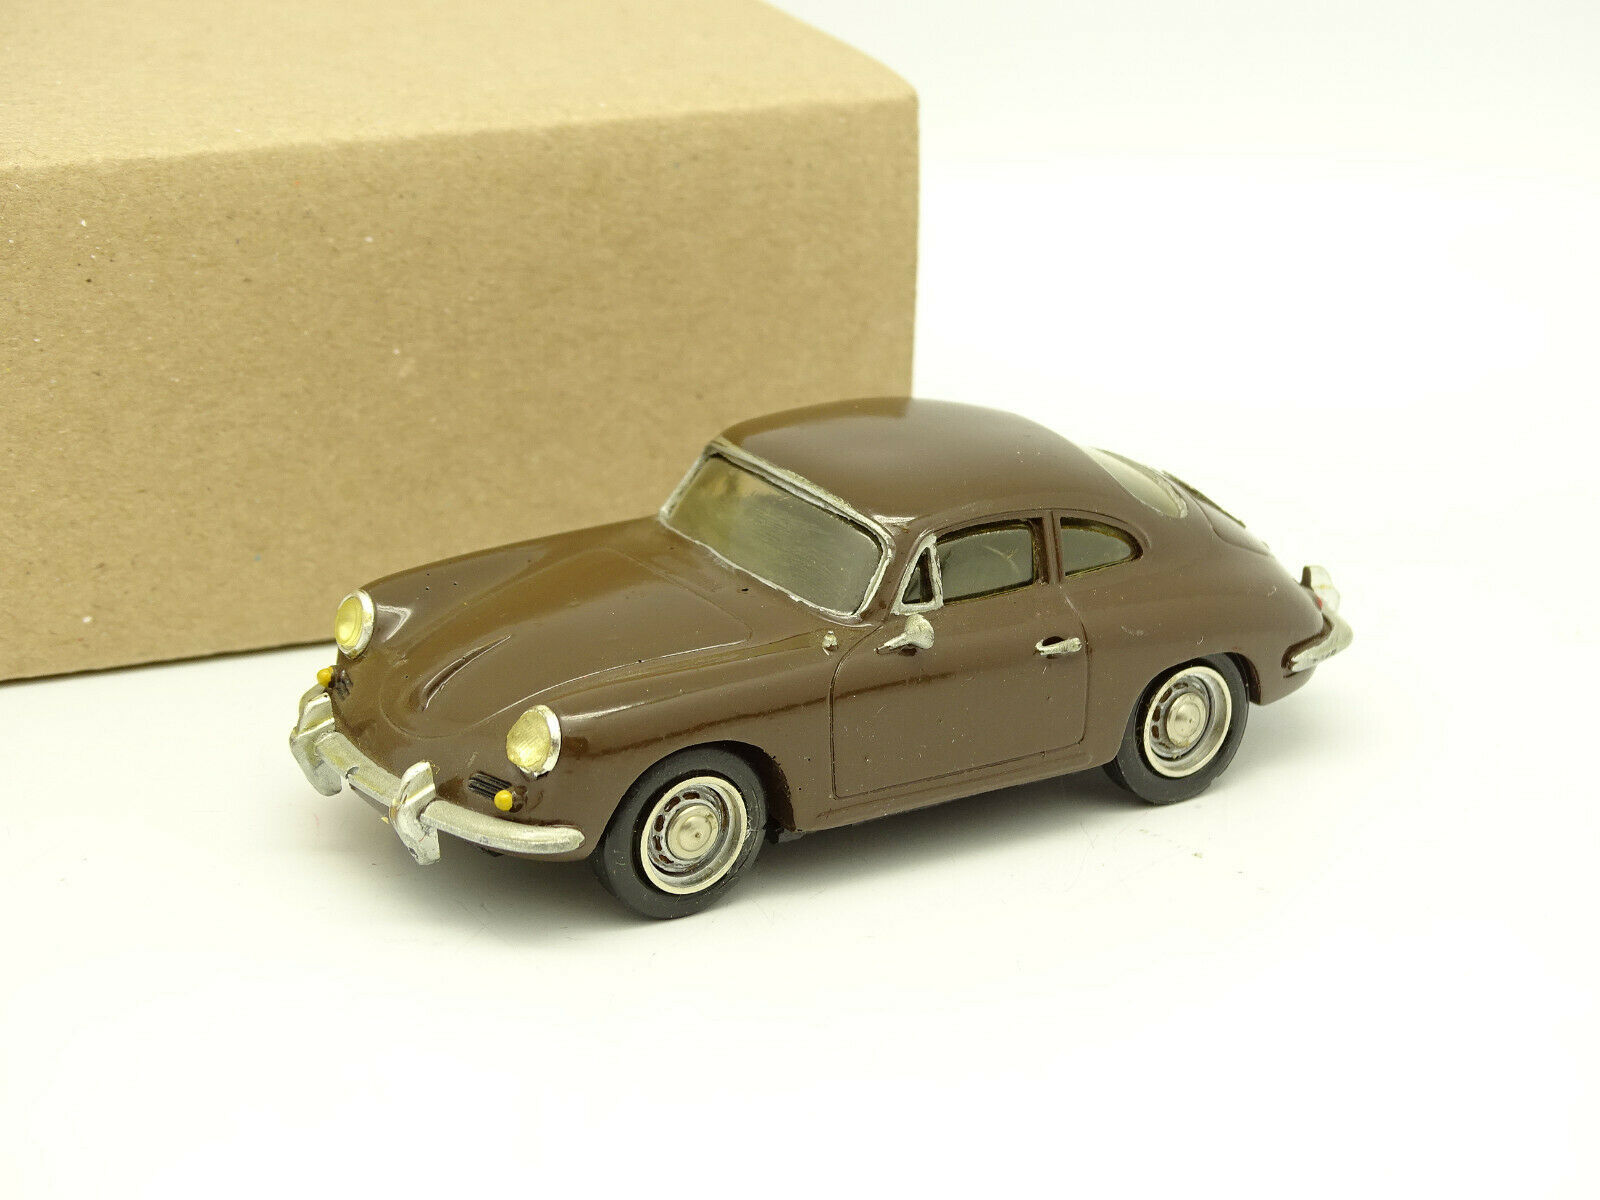 Record Kit Mounted Resin 1 43 - Porsche 356 B- Brown